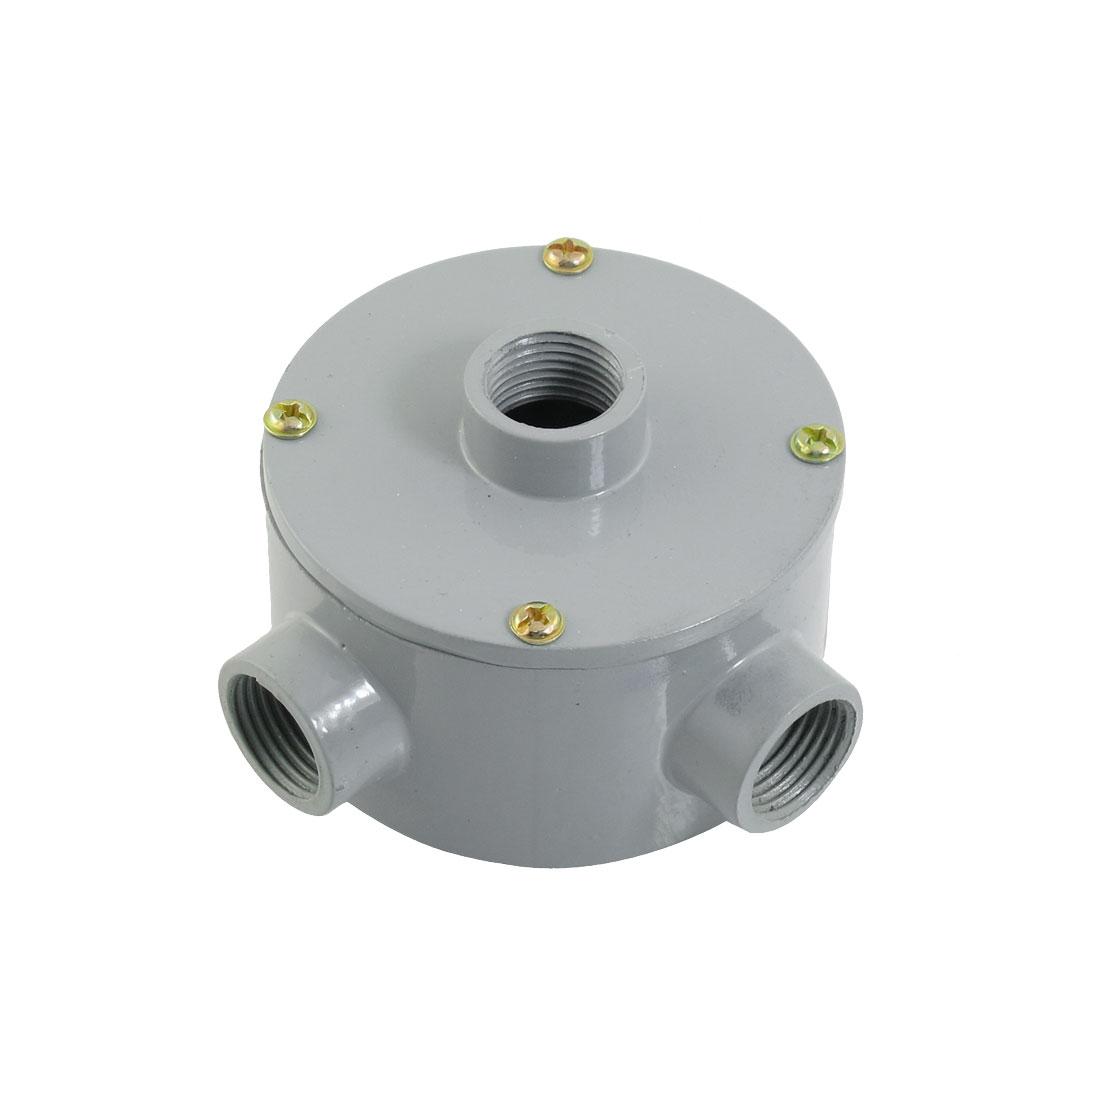 "G1/2"" Thread Three Holes Conduit Wiring Round Metal Junction Box"